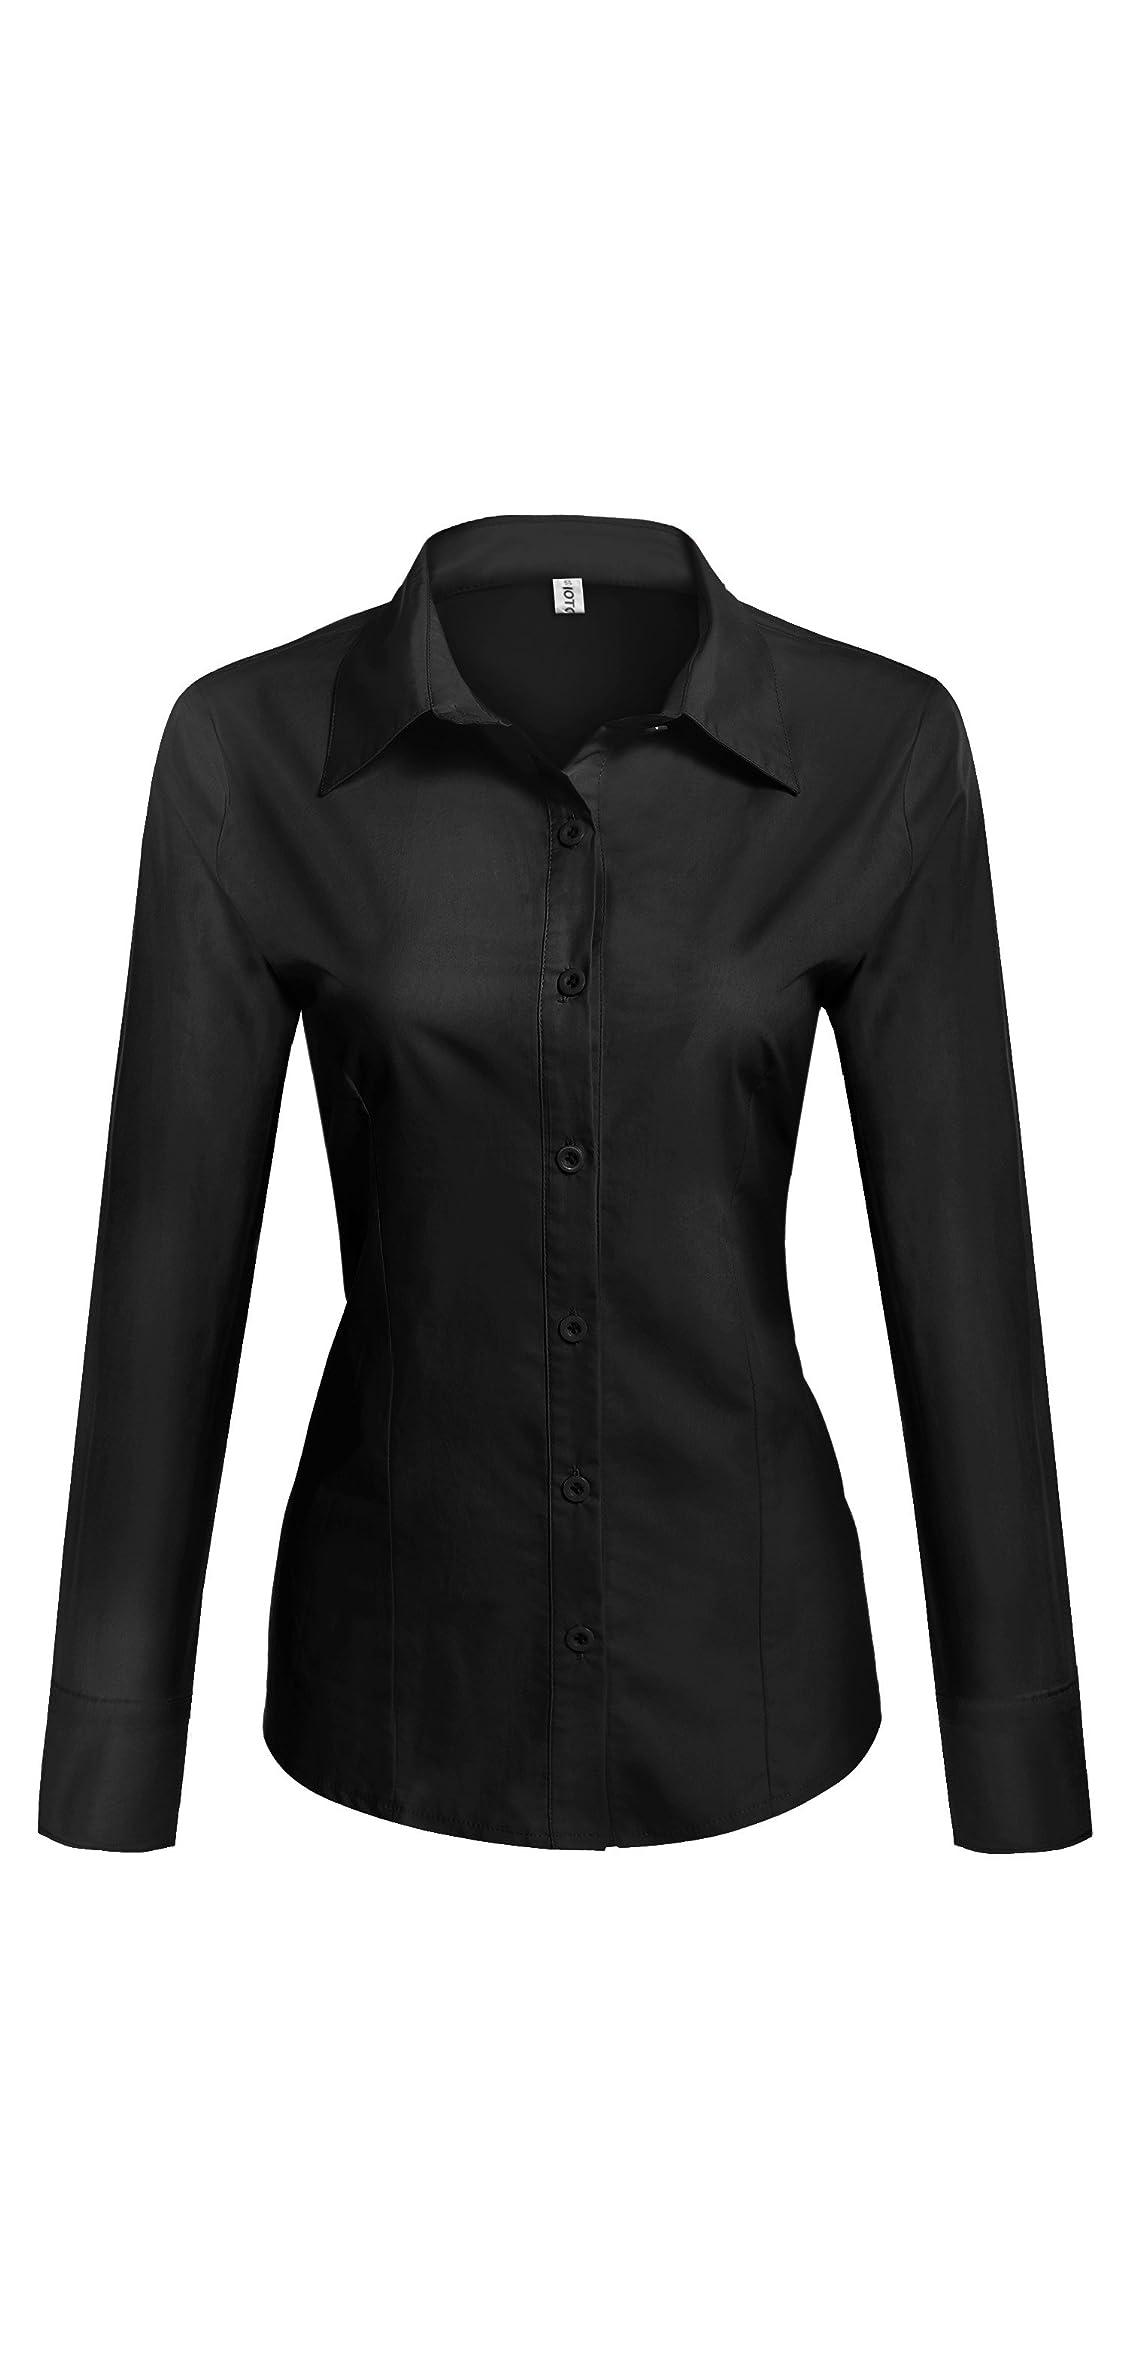 Womens Cotton Basic Simple Button Down Shirt Slim Fit